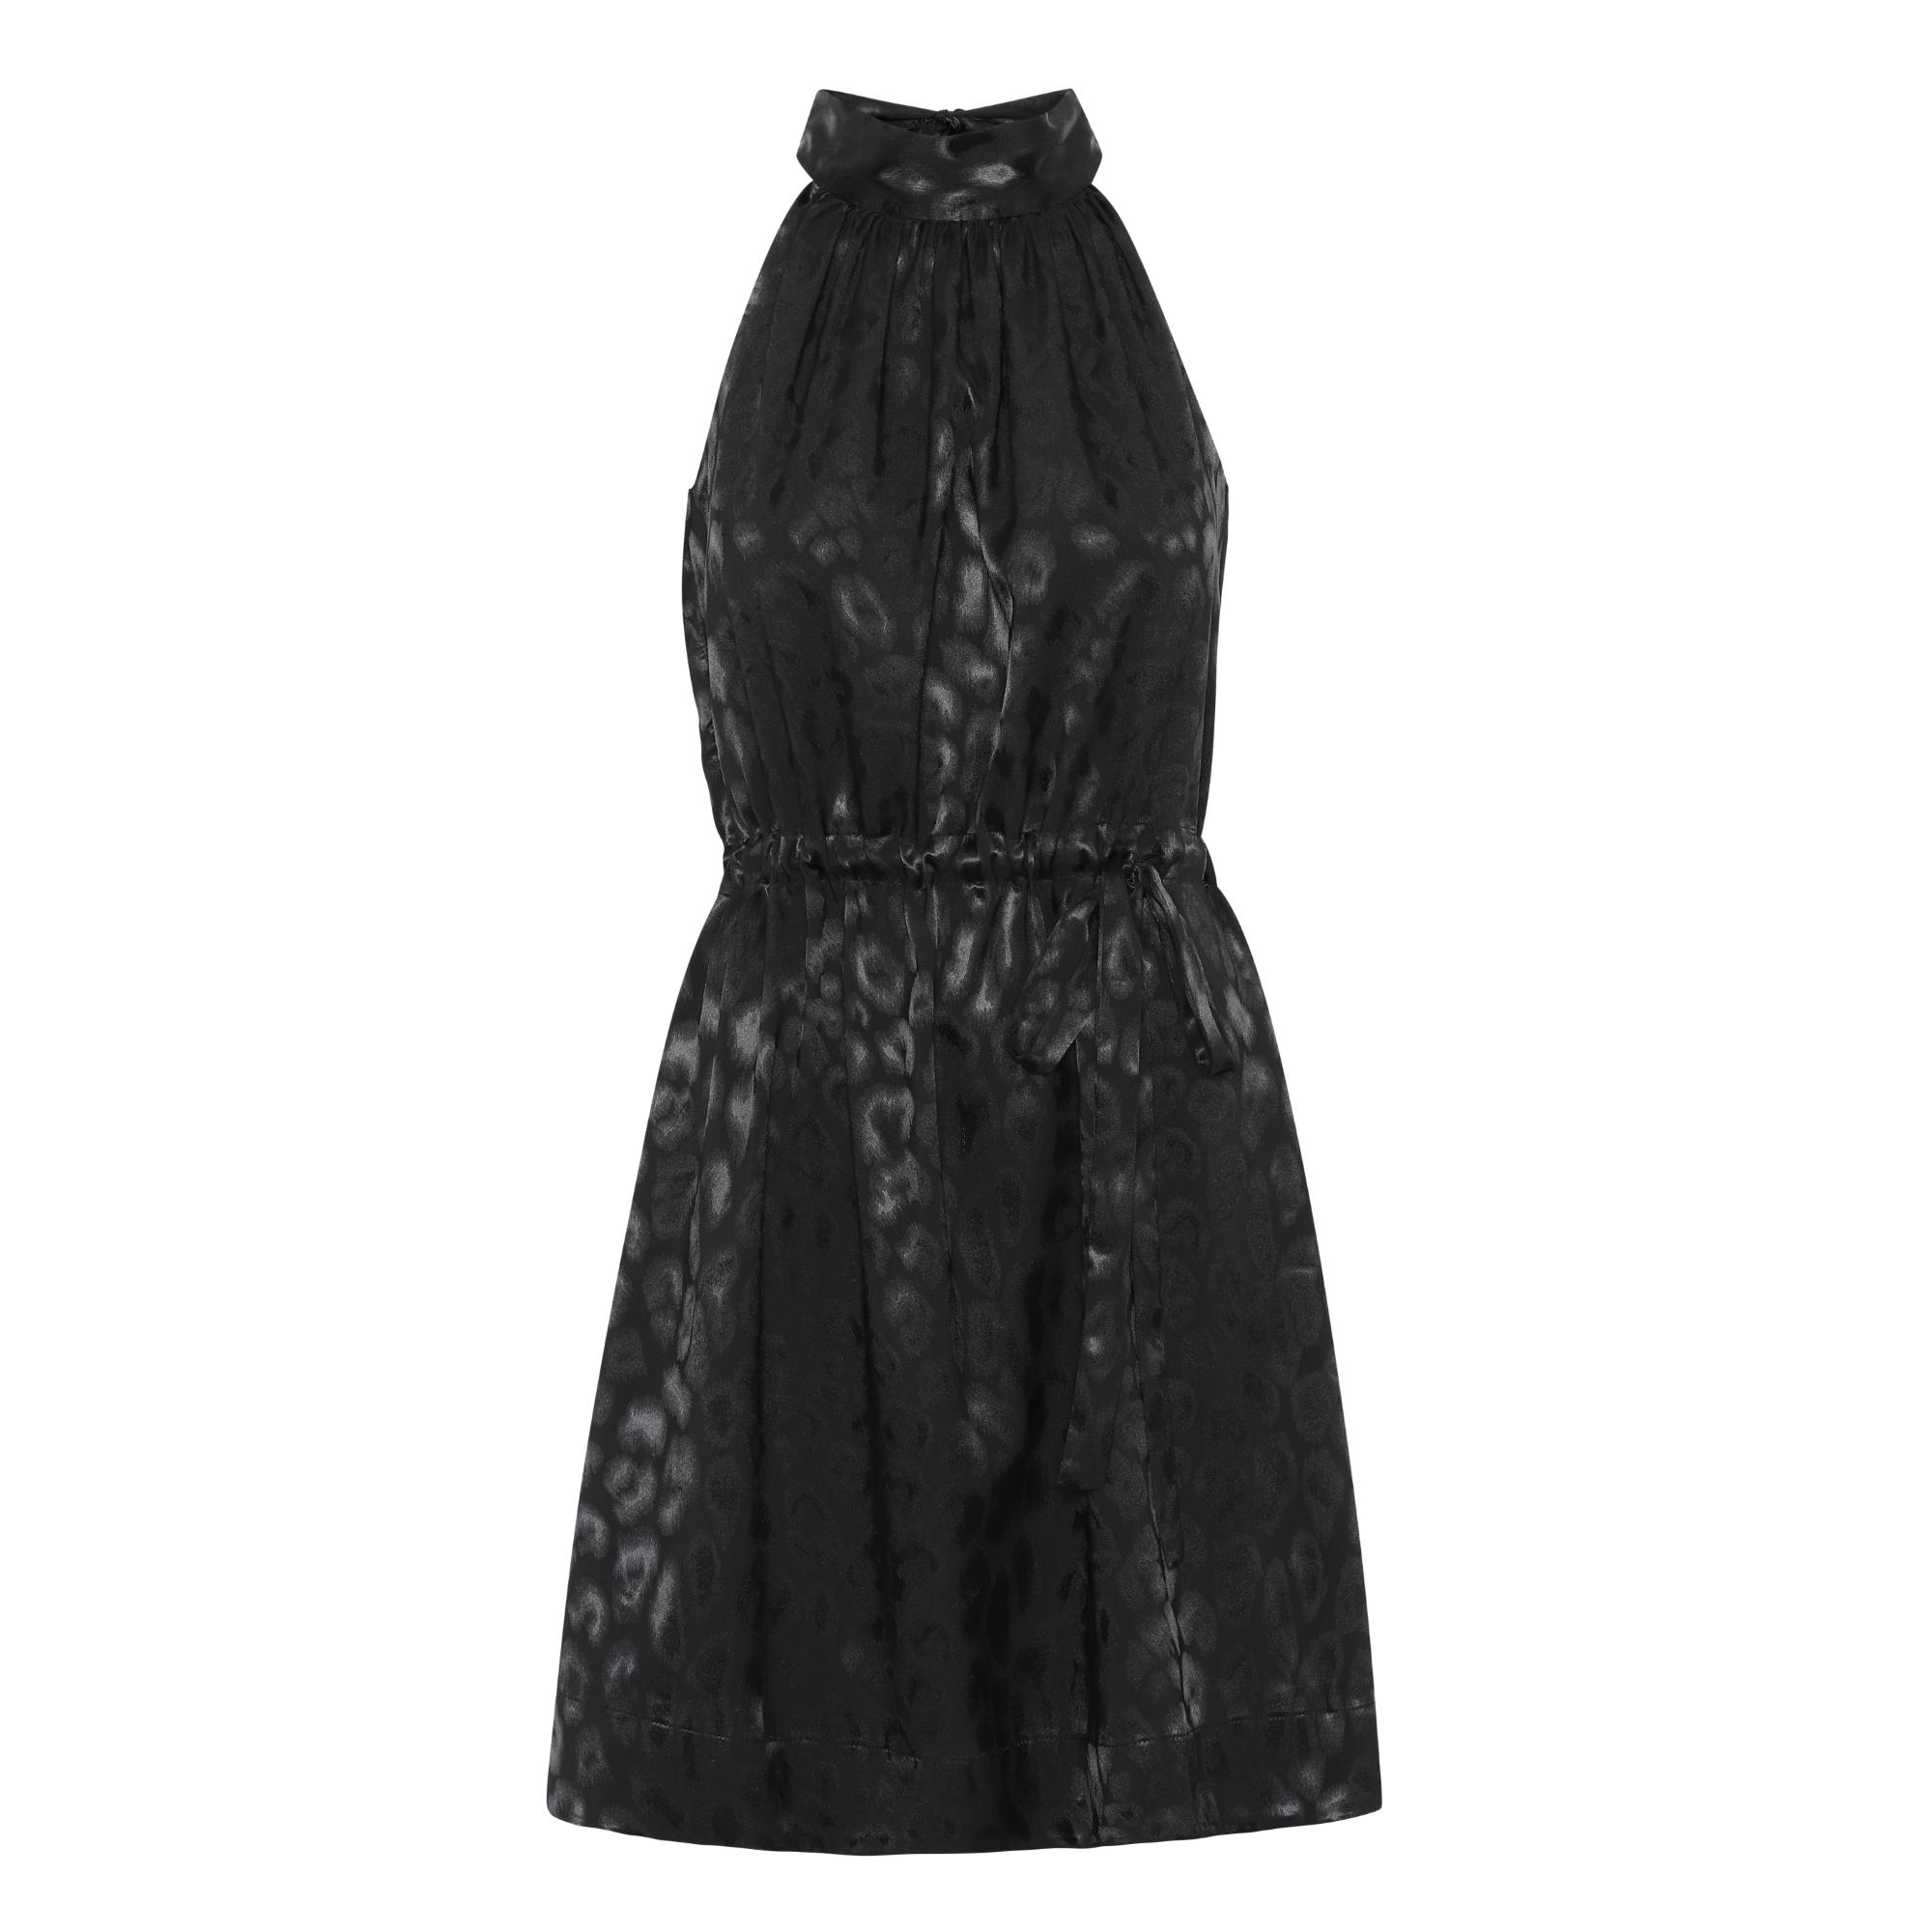 Black-Leo-Constance-Dress KARMAMIA IMAGE BY ME